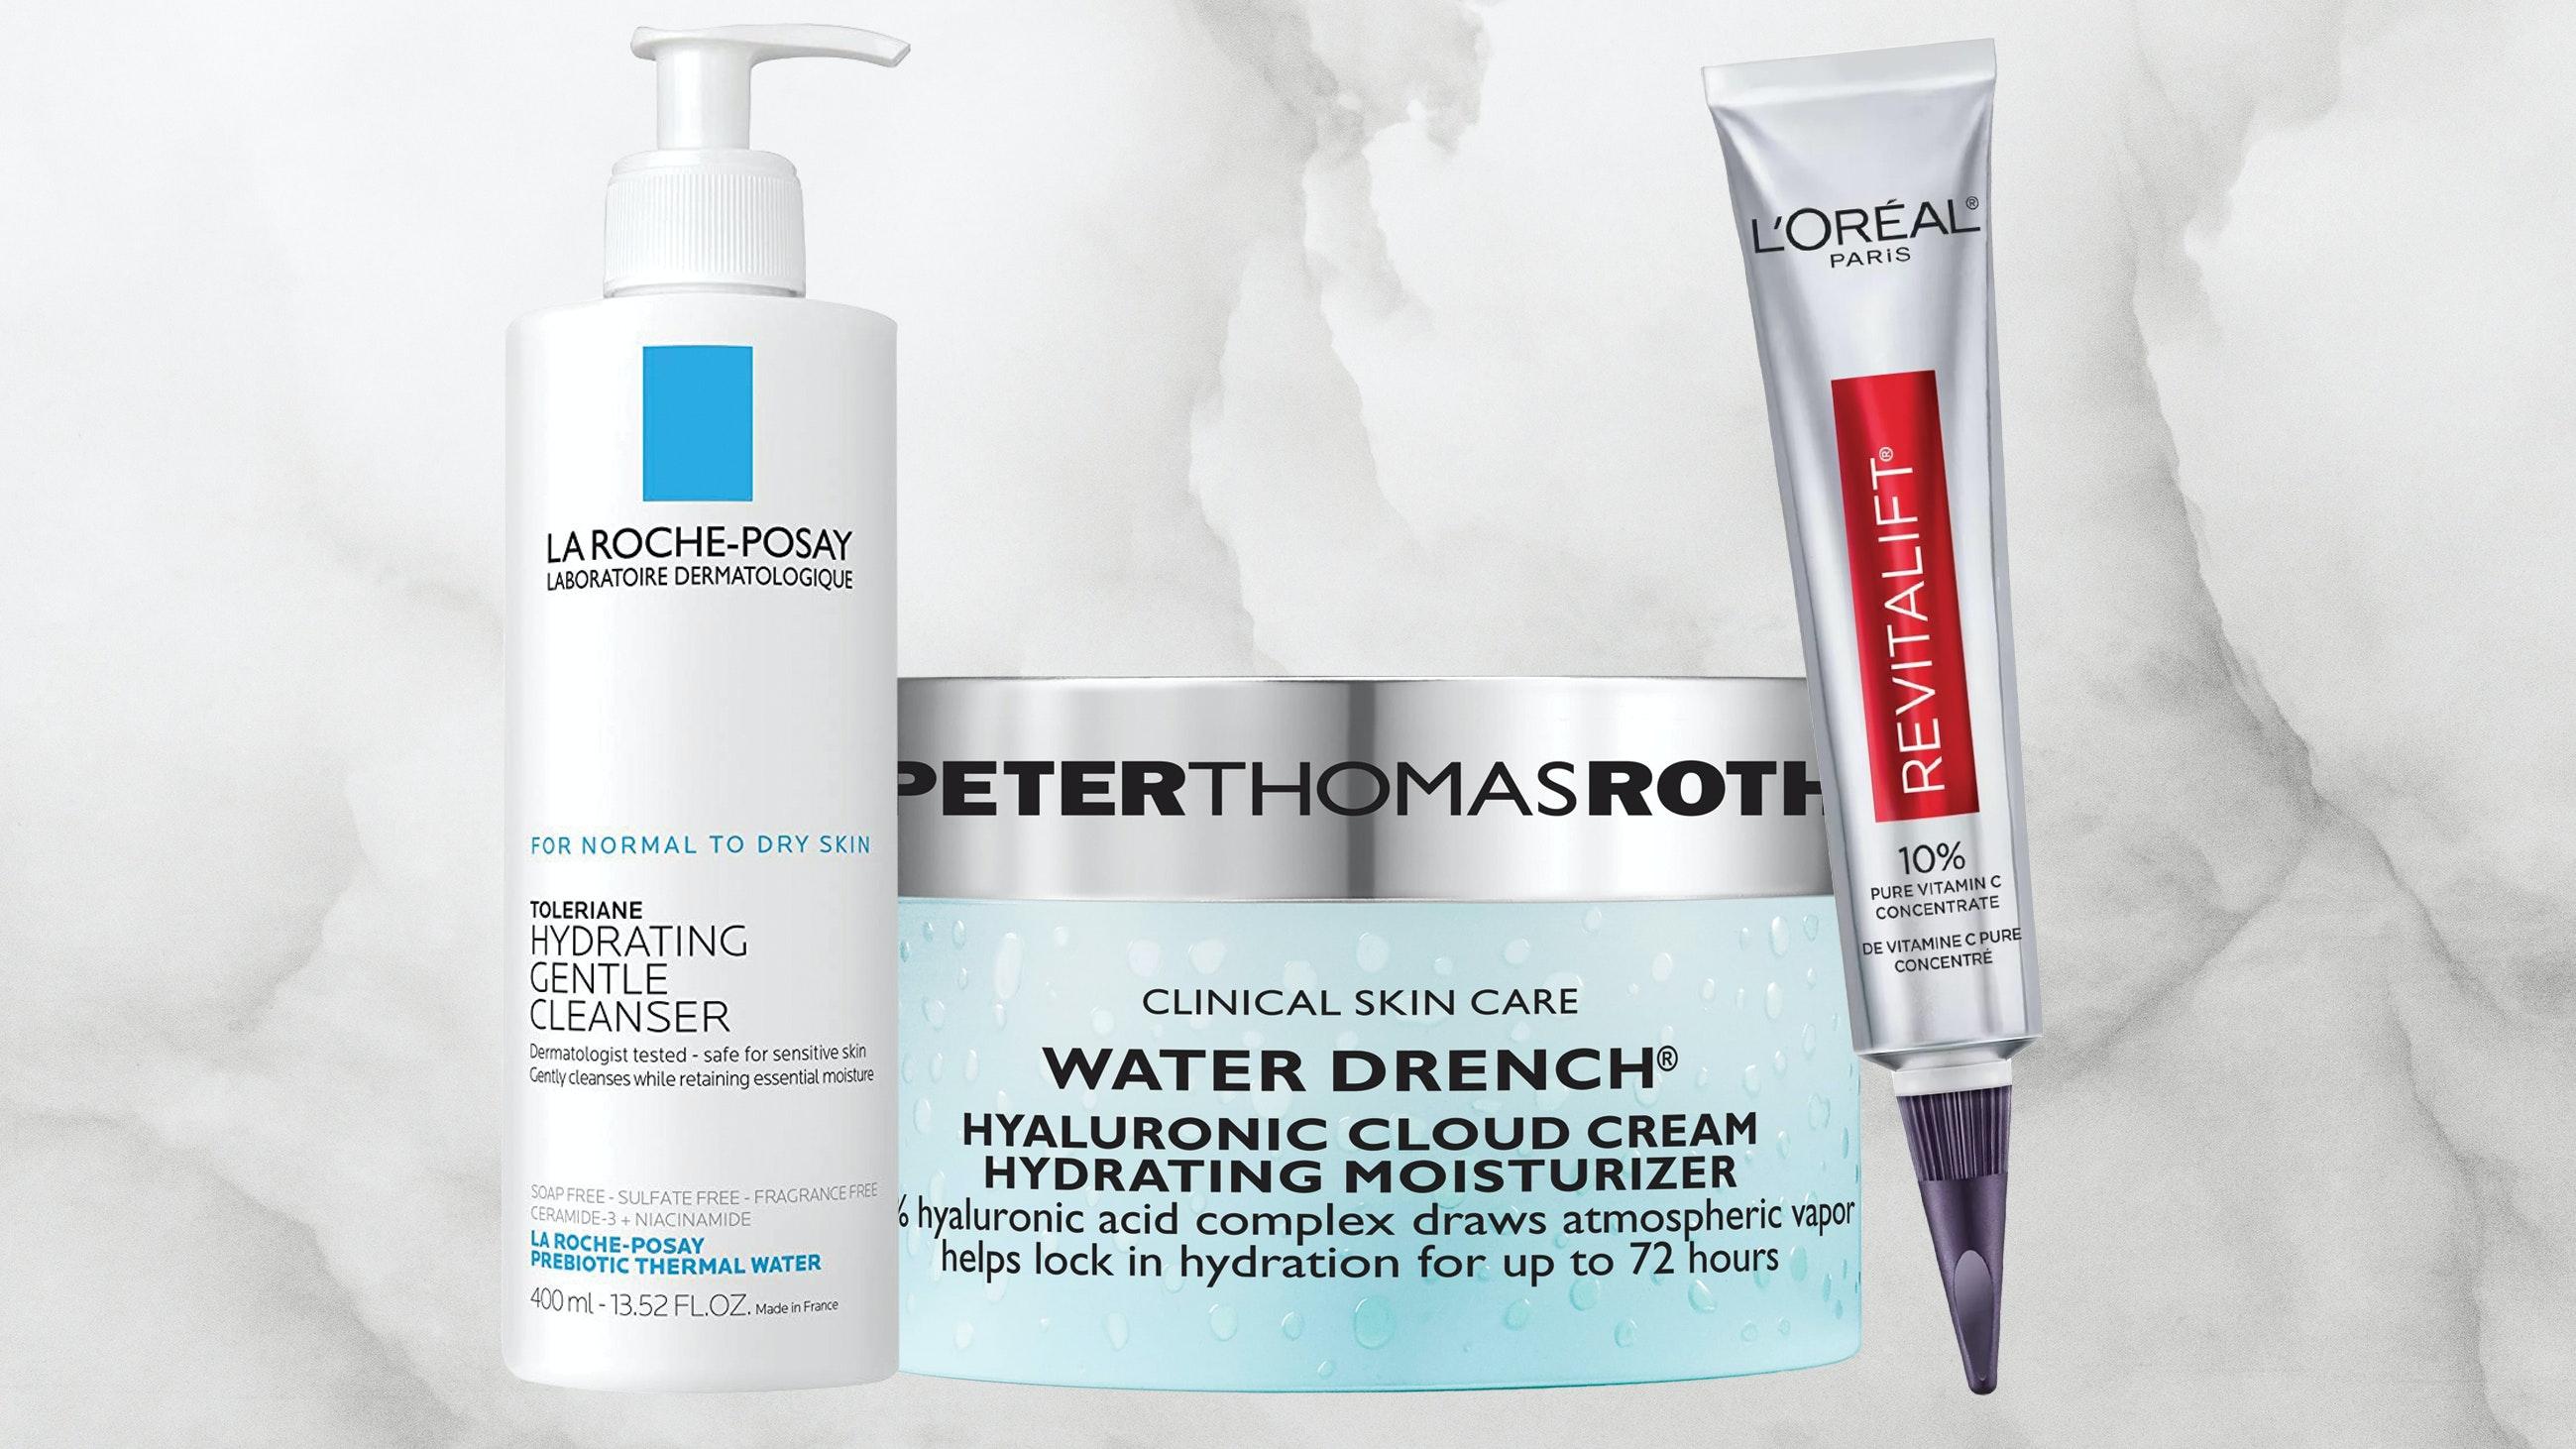 Assortment of moisturizing skincare items